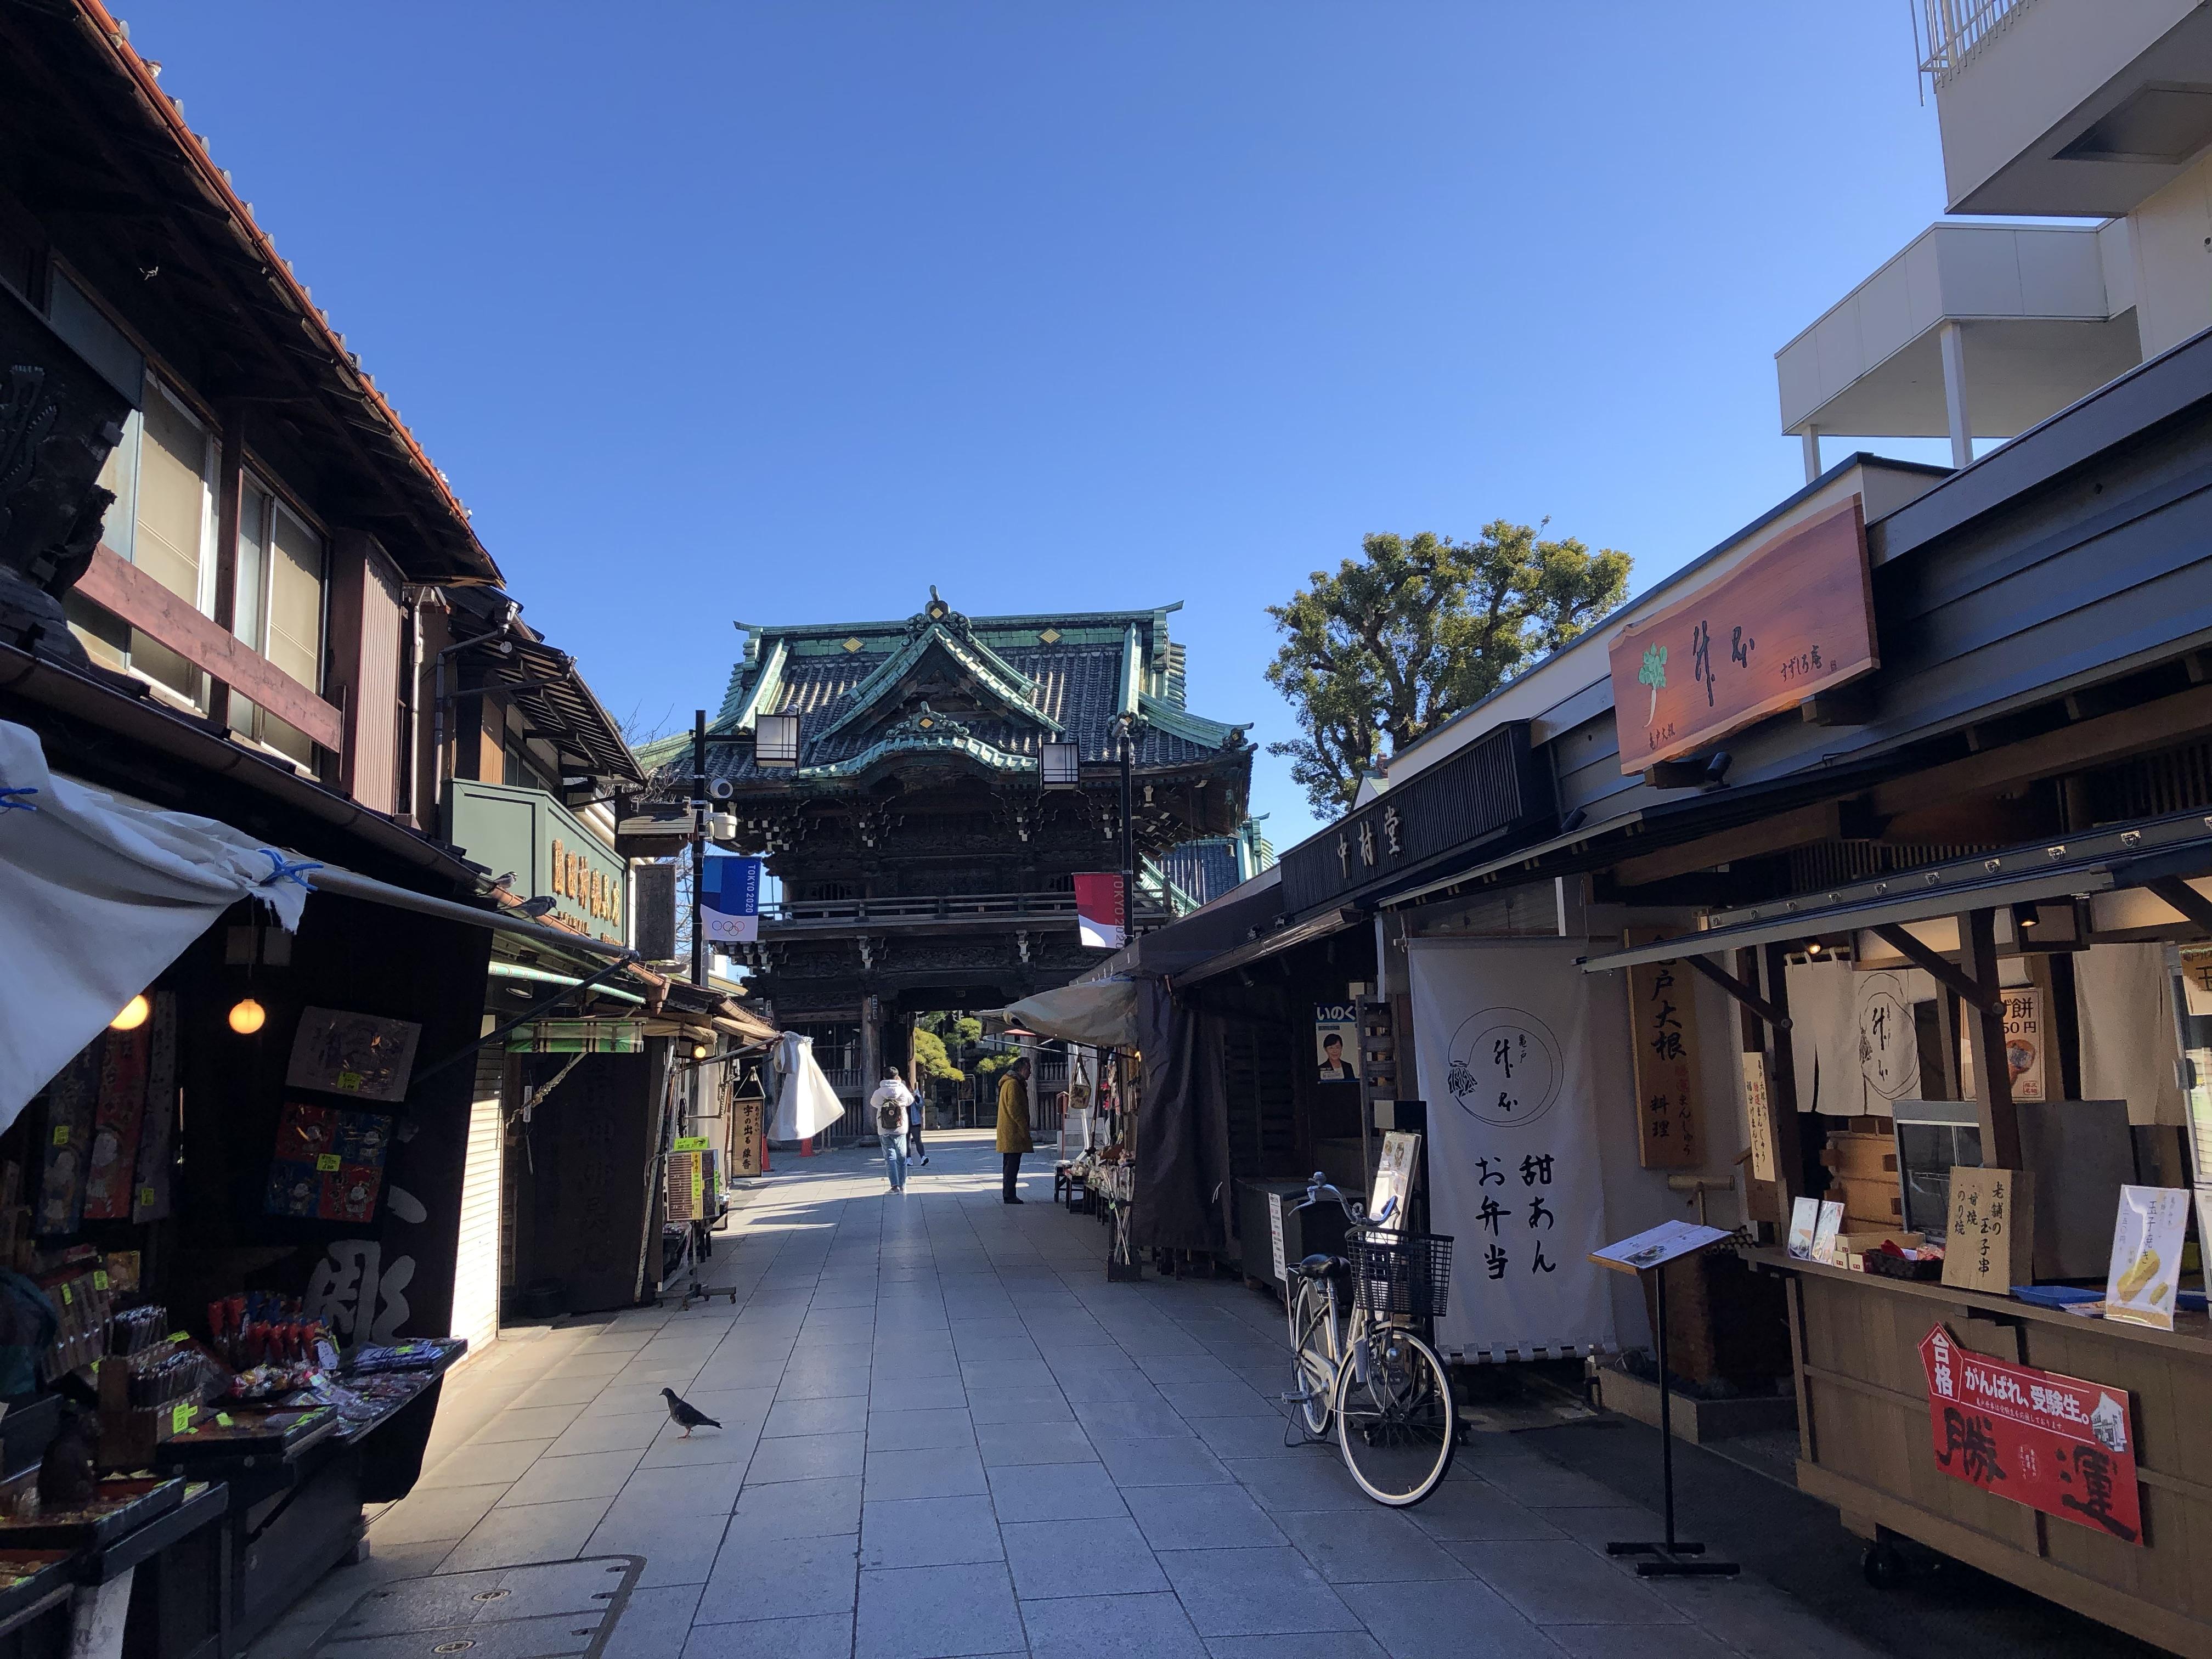 Shibamata : le nord de Tokyo hors des sentiers battus